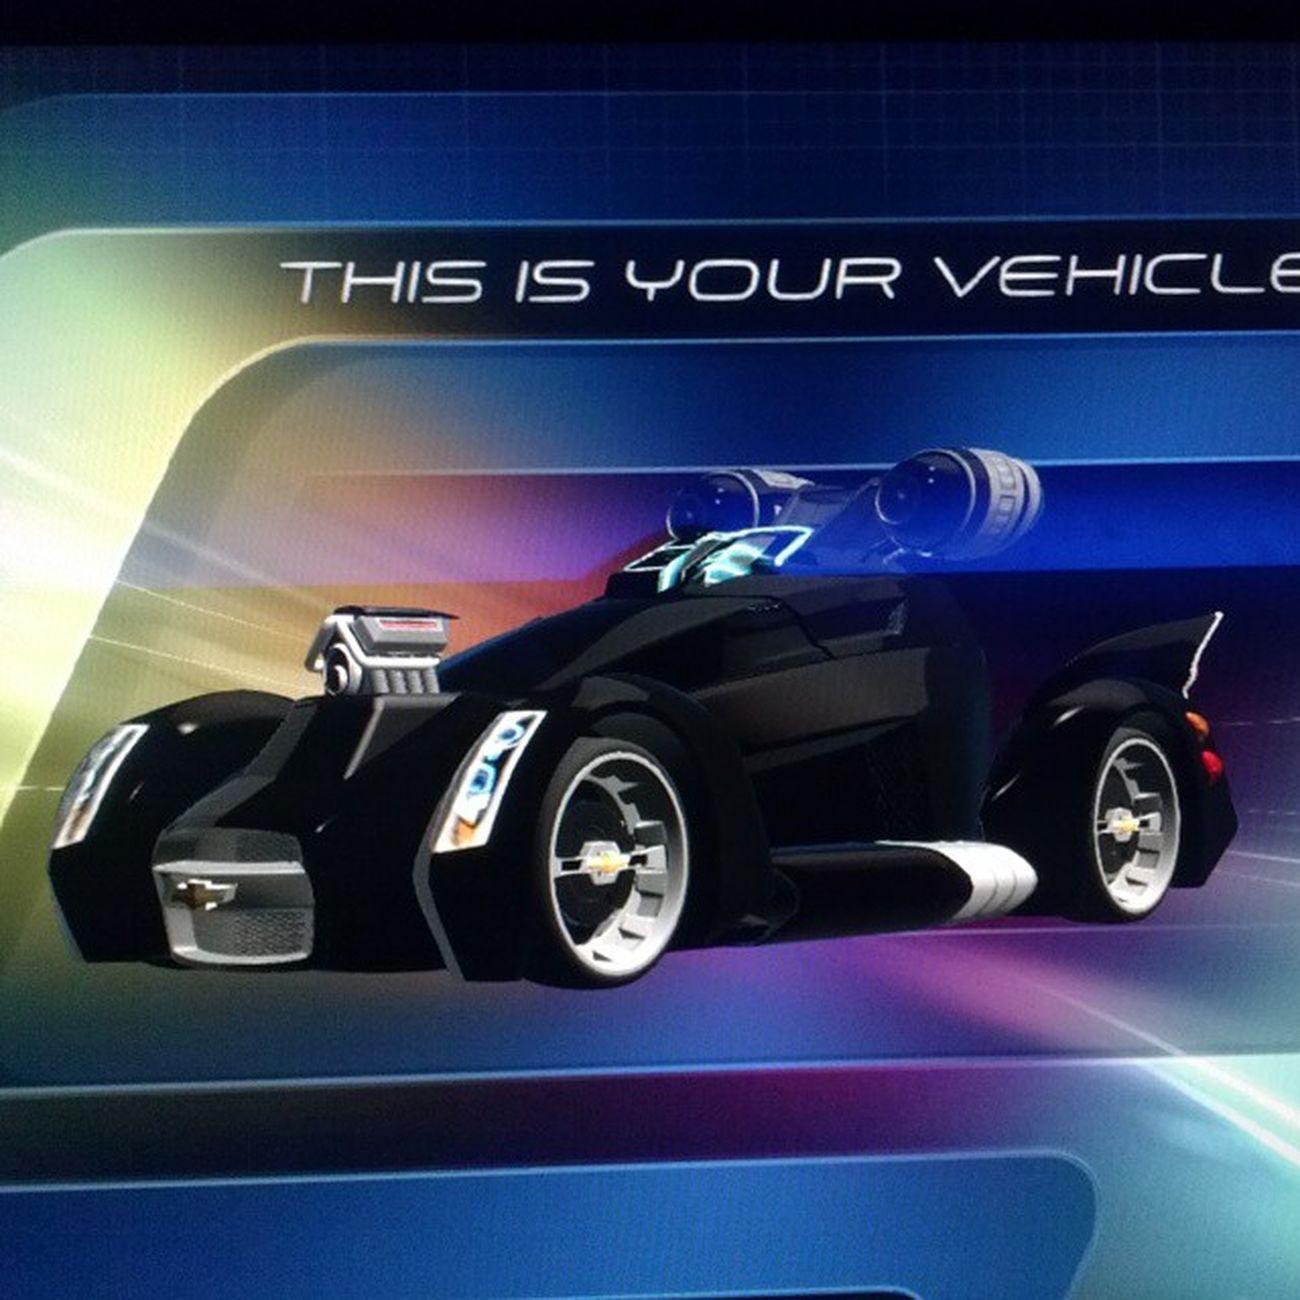 My car design at Testtrack at DisneyWorld Disney Epcot